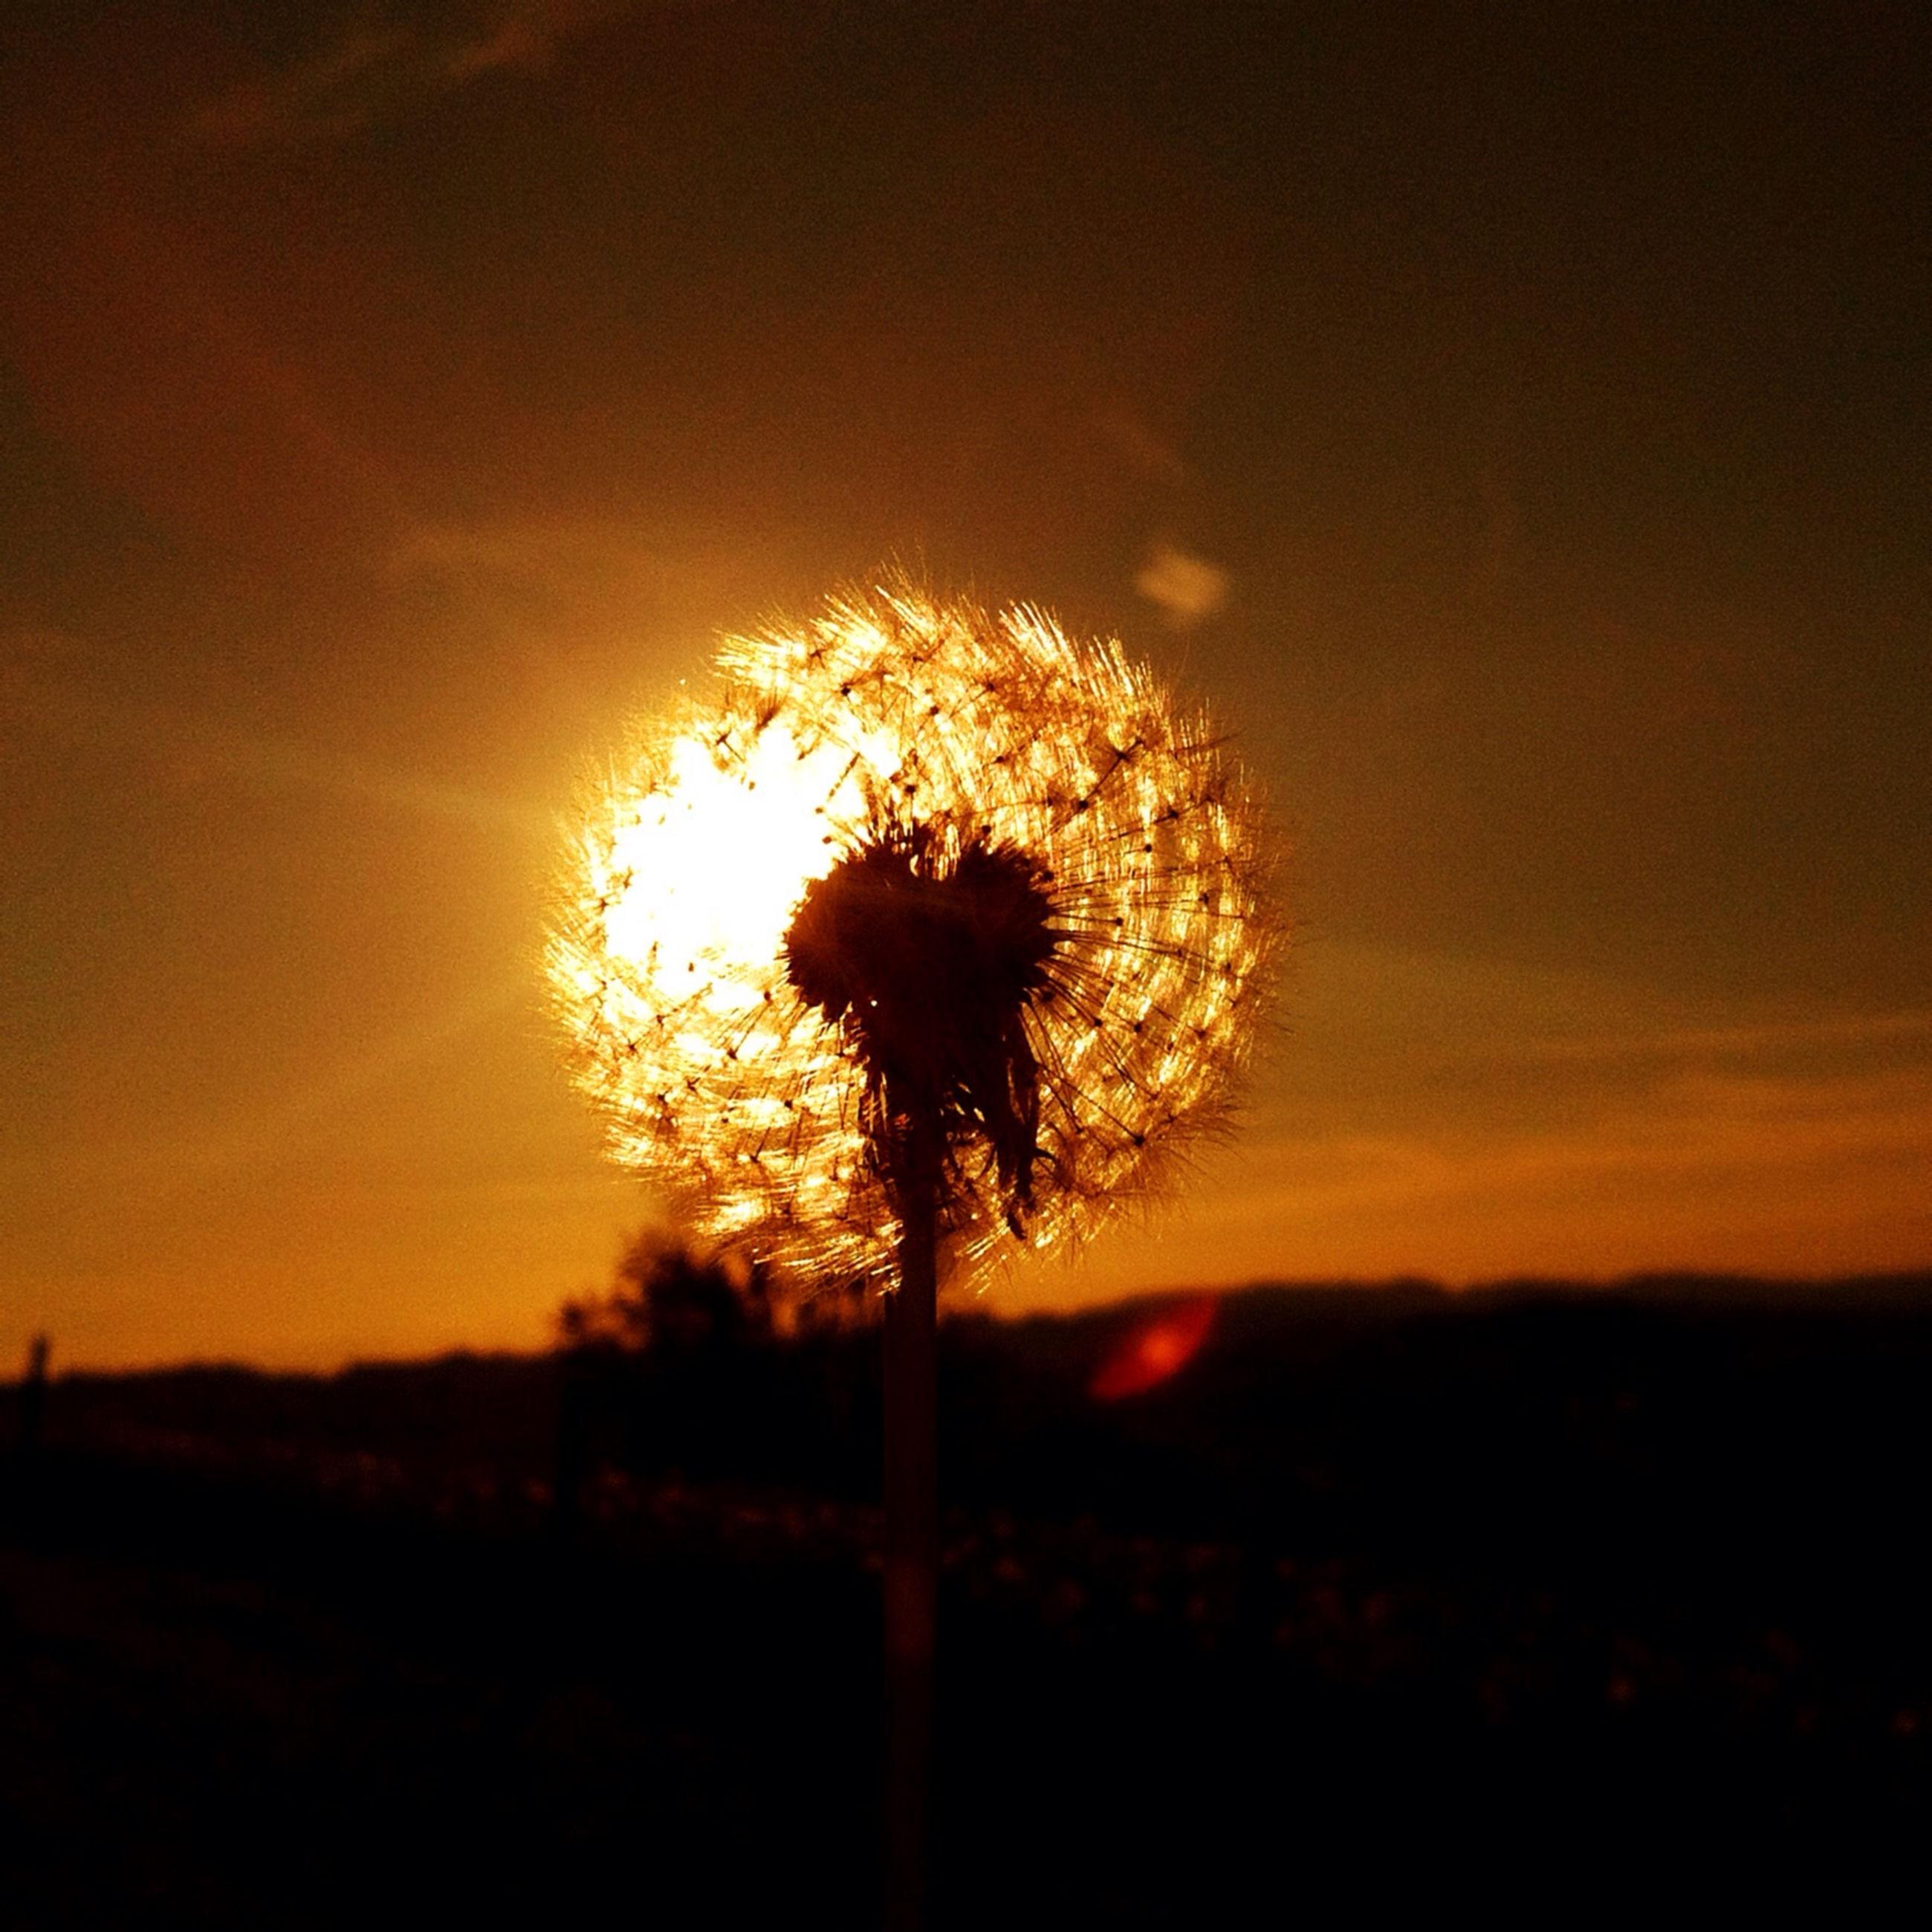 sunset, flower, silhouette, beauty in nature, sky, dandelion, growth, nature, tranquility, fragility, field, plant, flower head, orange color, stem, sun, scenics, tranquil scene, single flower, outdoors